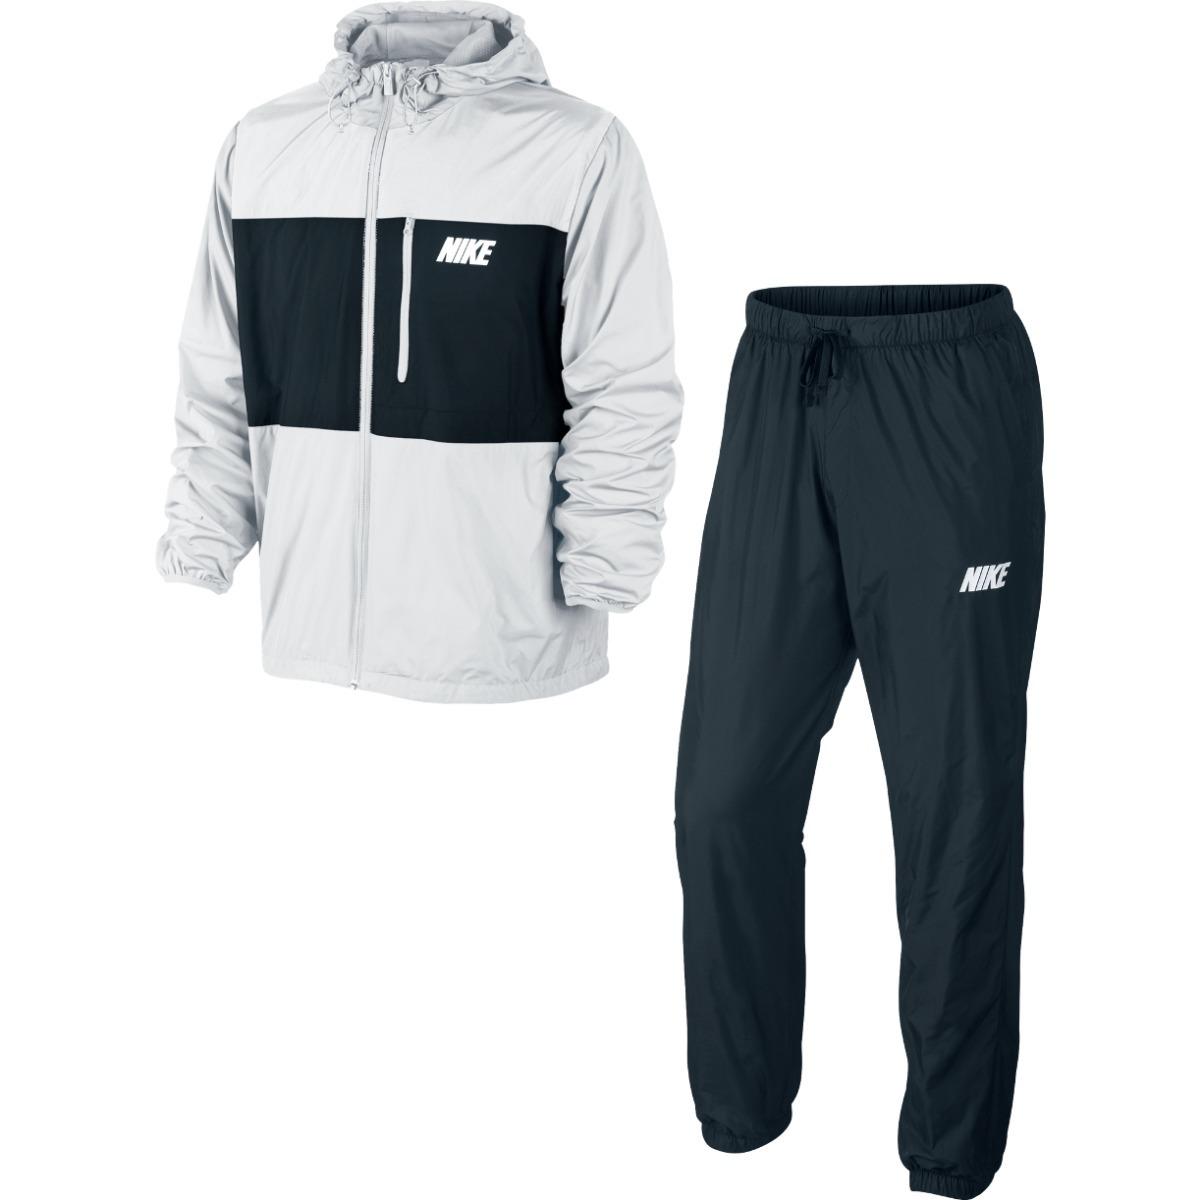 conjunto nike pants deportivo nike talla s original. Cargando zoom. 9833bc5e4d3ba